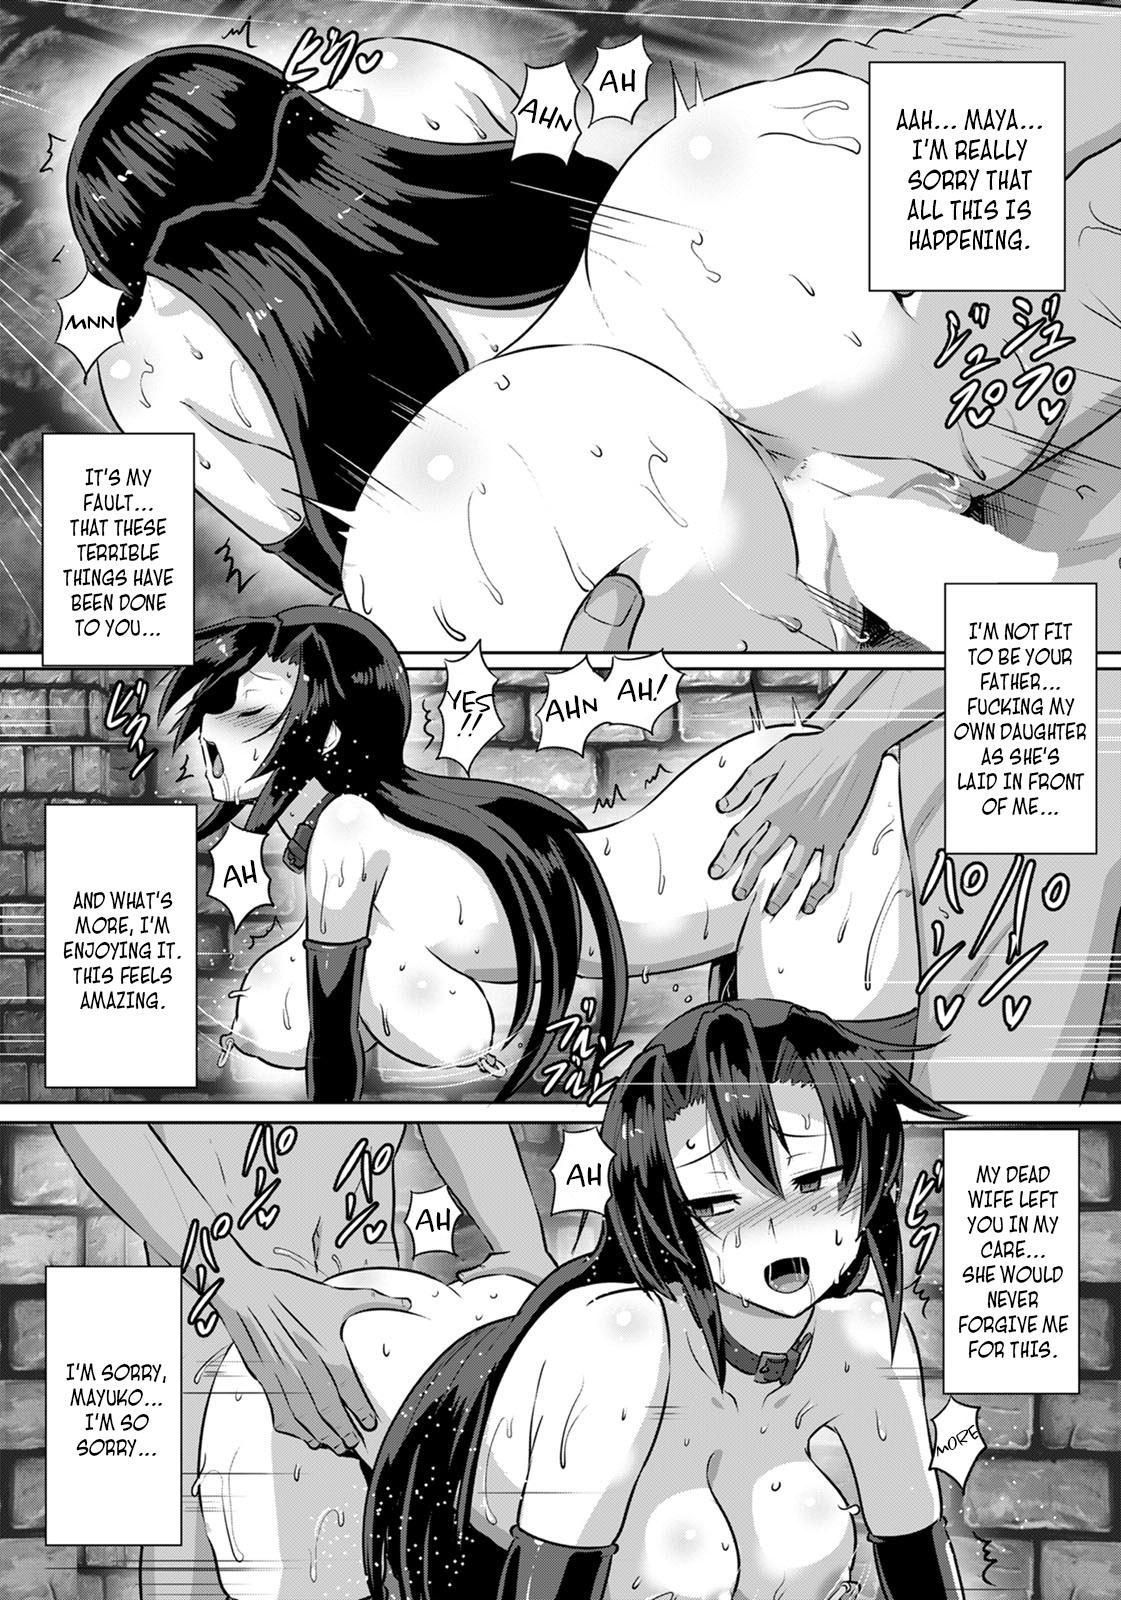 [Kumoemon] Shakkin JK Kansai Roku ~Oyako Soukan Hen~ | A Record of a High School Girl Settling Her Debts With Rape - Part 3 (ANGEL Club 2020-12) [English] [CBS] [Digital] 15